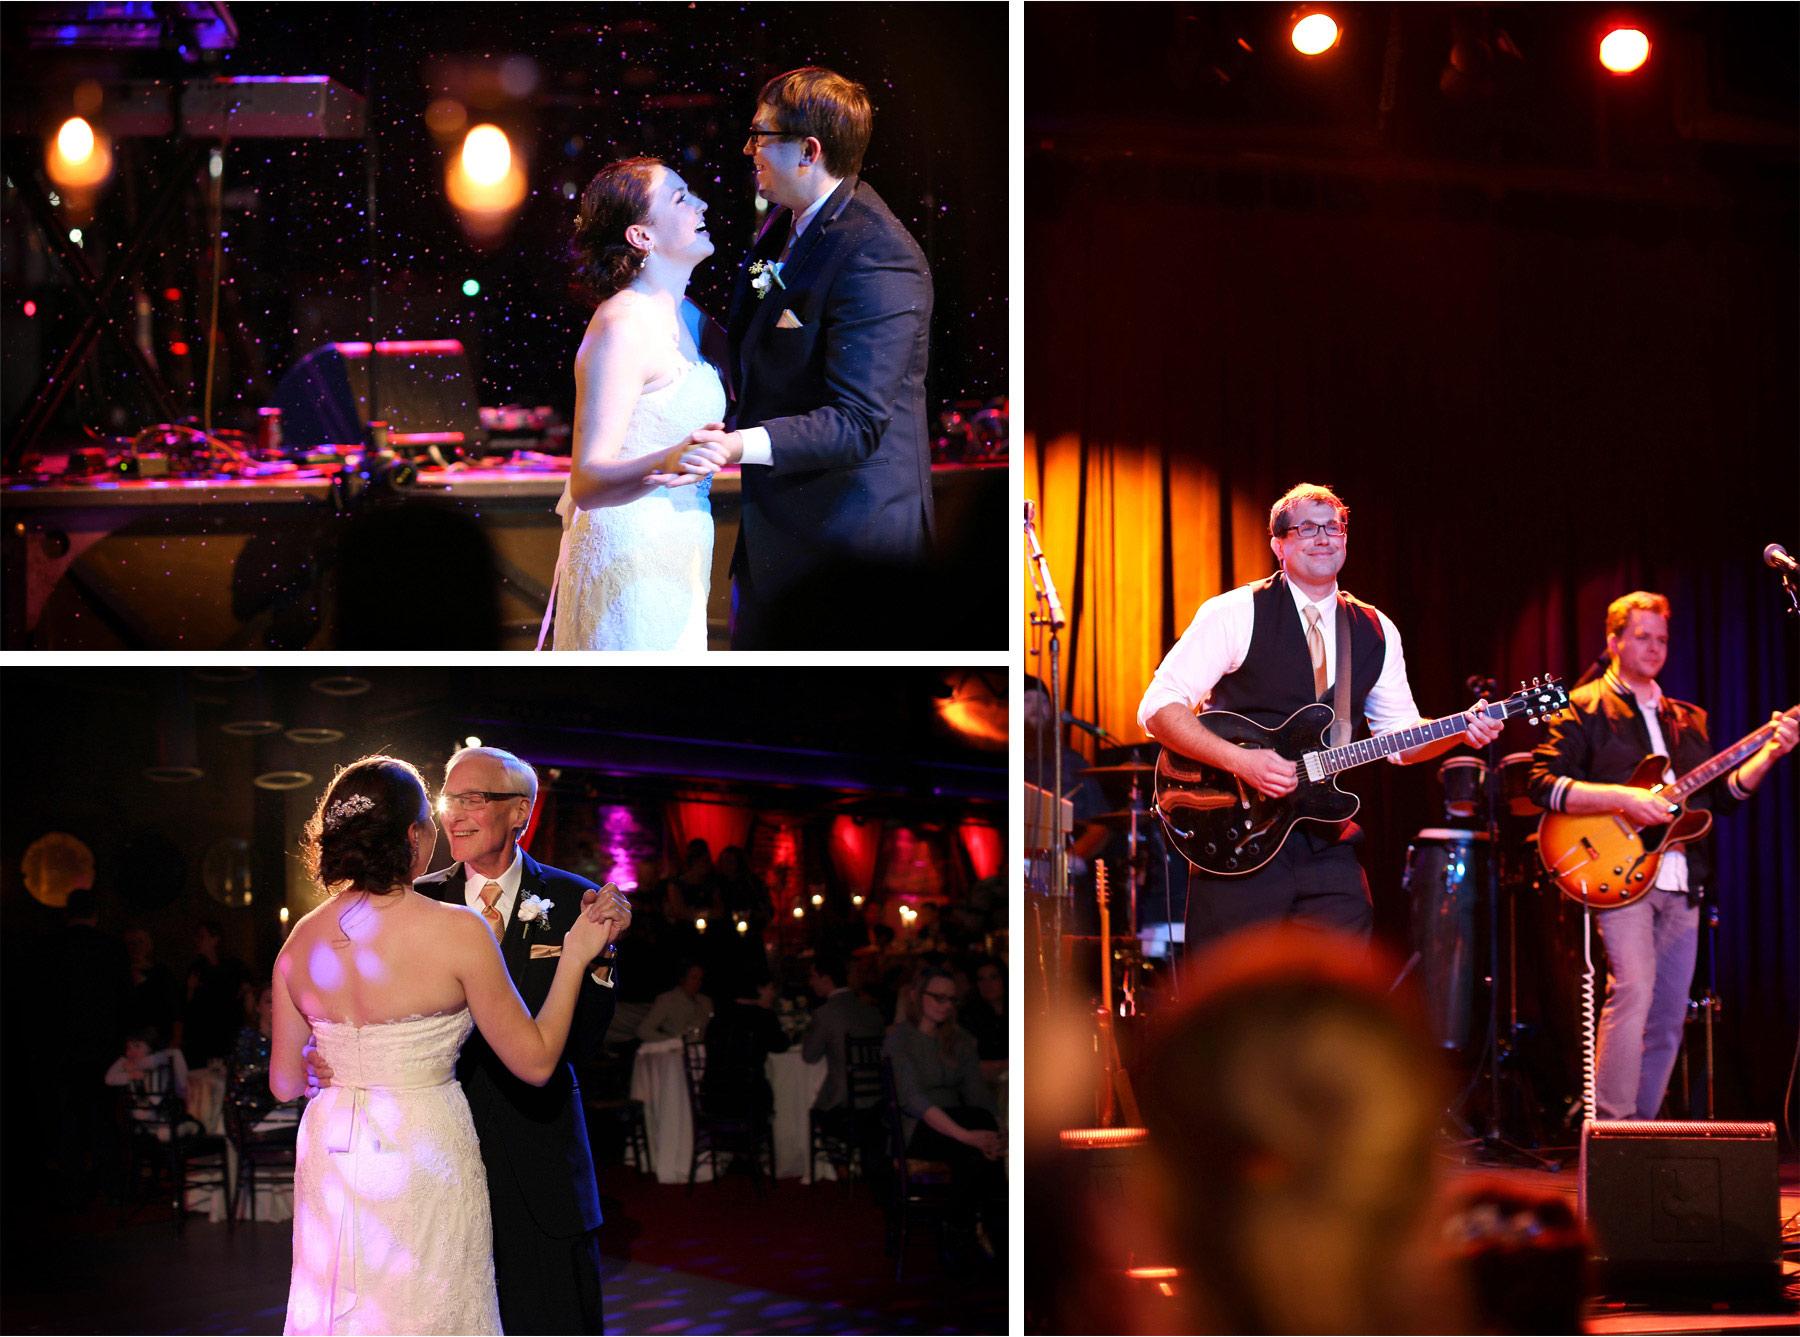 21-Minneapolis-Minnesota-Wedding-Photographer-by-Andrew-Vick-Photography-Winter-Varsity-Theater-Reception-Bride-Groom-Dance-Snow-Confetti-Father-Parents-Band-Guitar-Viva-Knievel-Sara-and-Rob.jpg